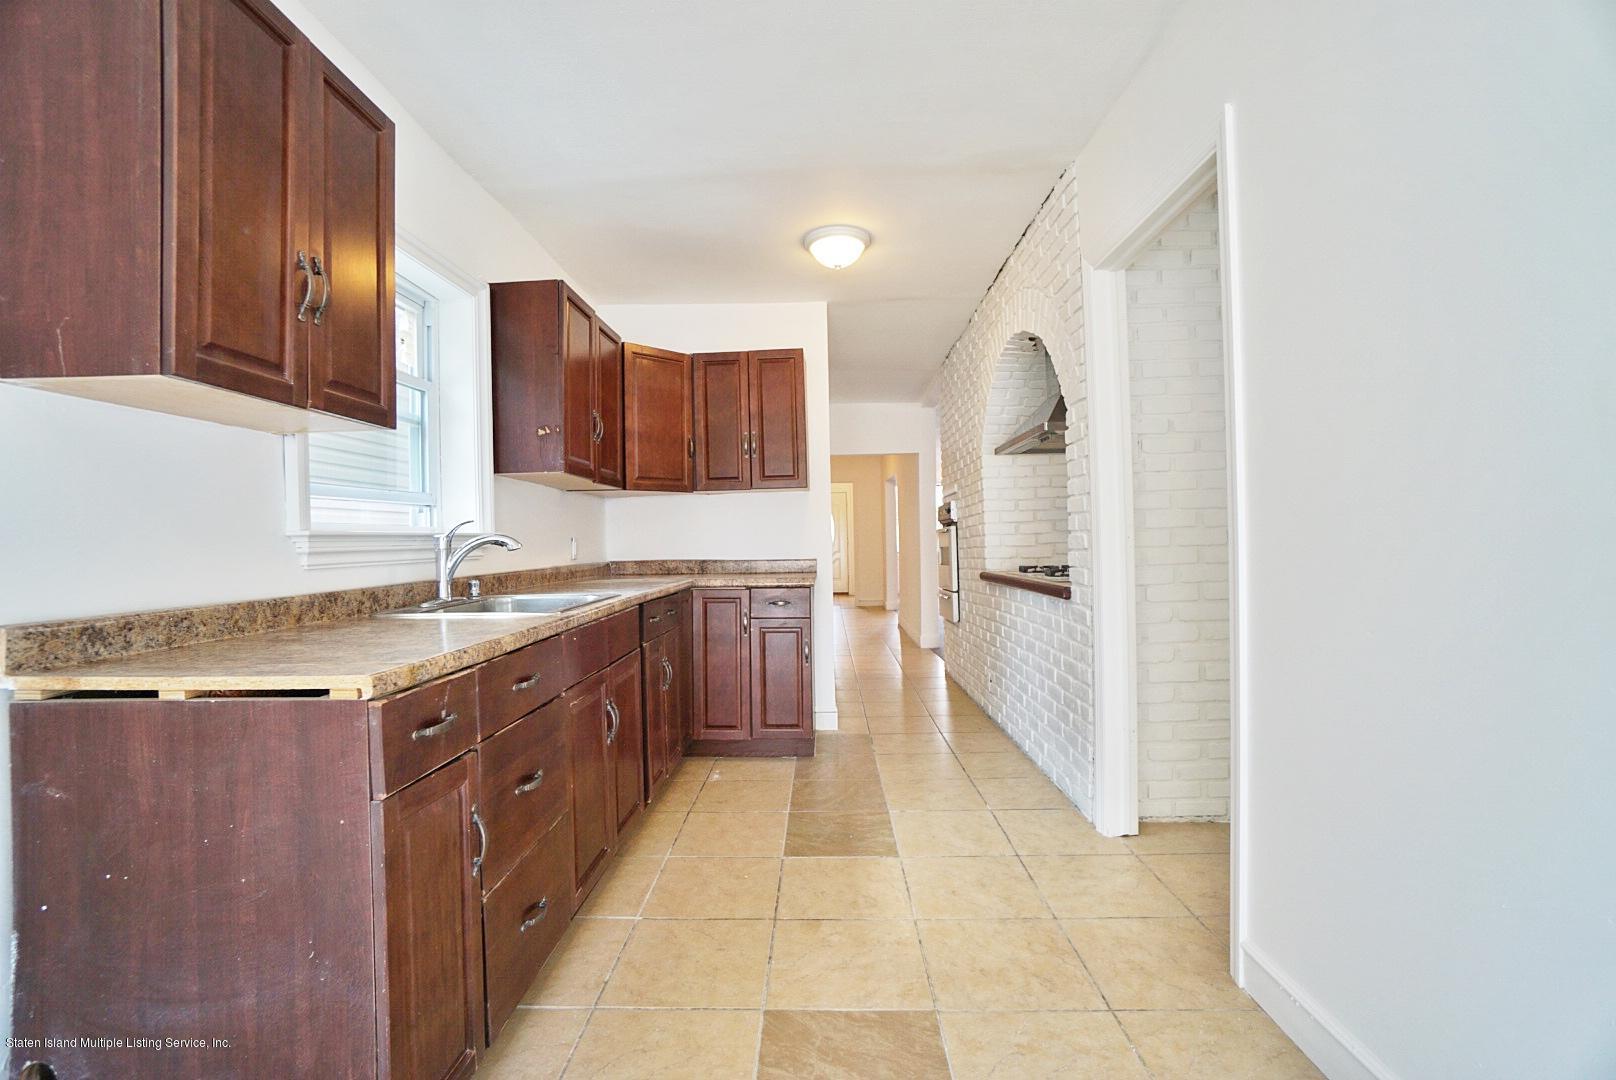 Single Family - Detached 53 Dubois Avenue  Staten Island, NY 10310, MLS-1128749-24